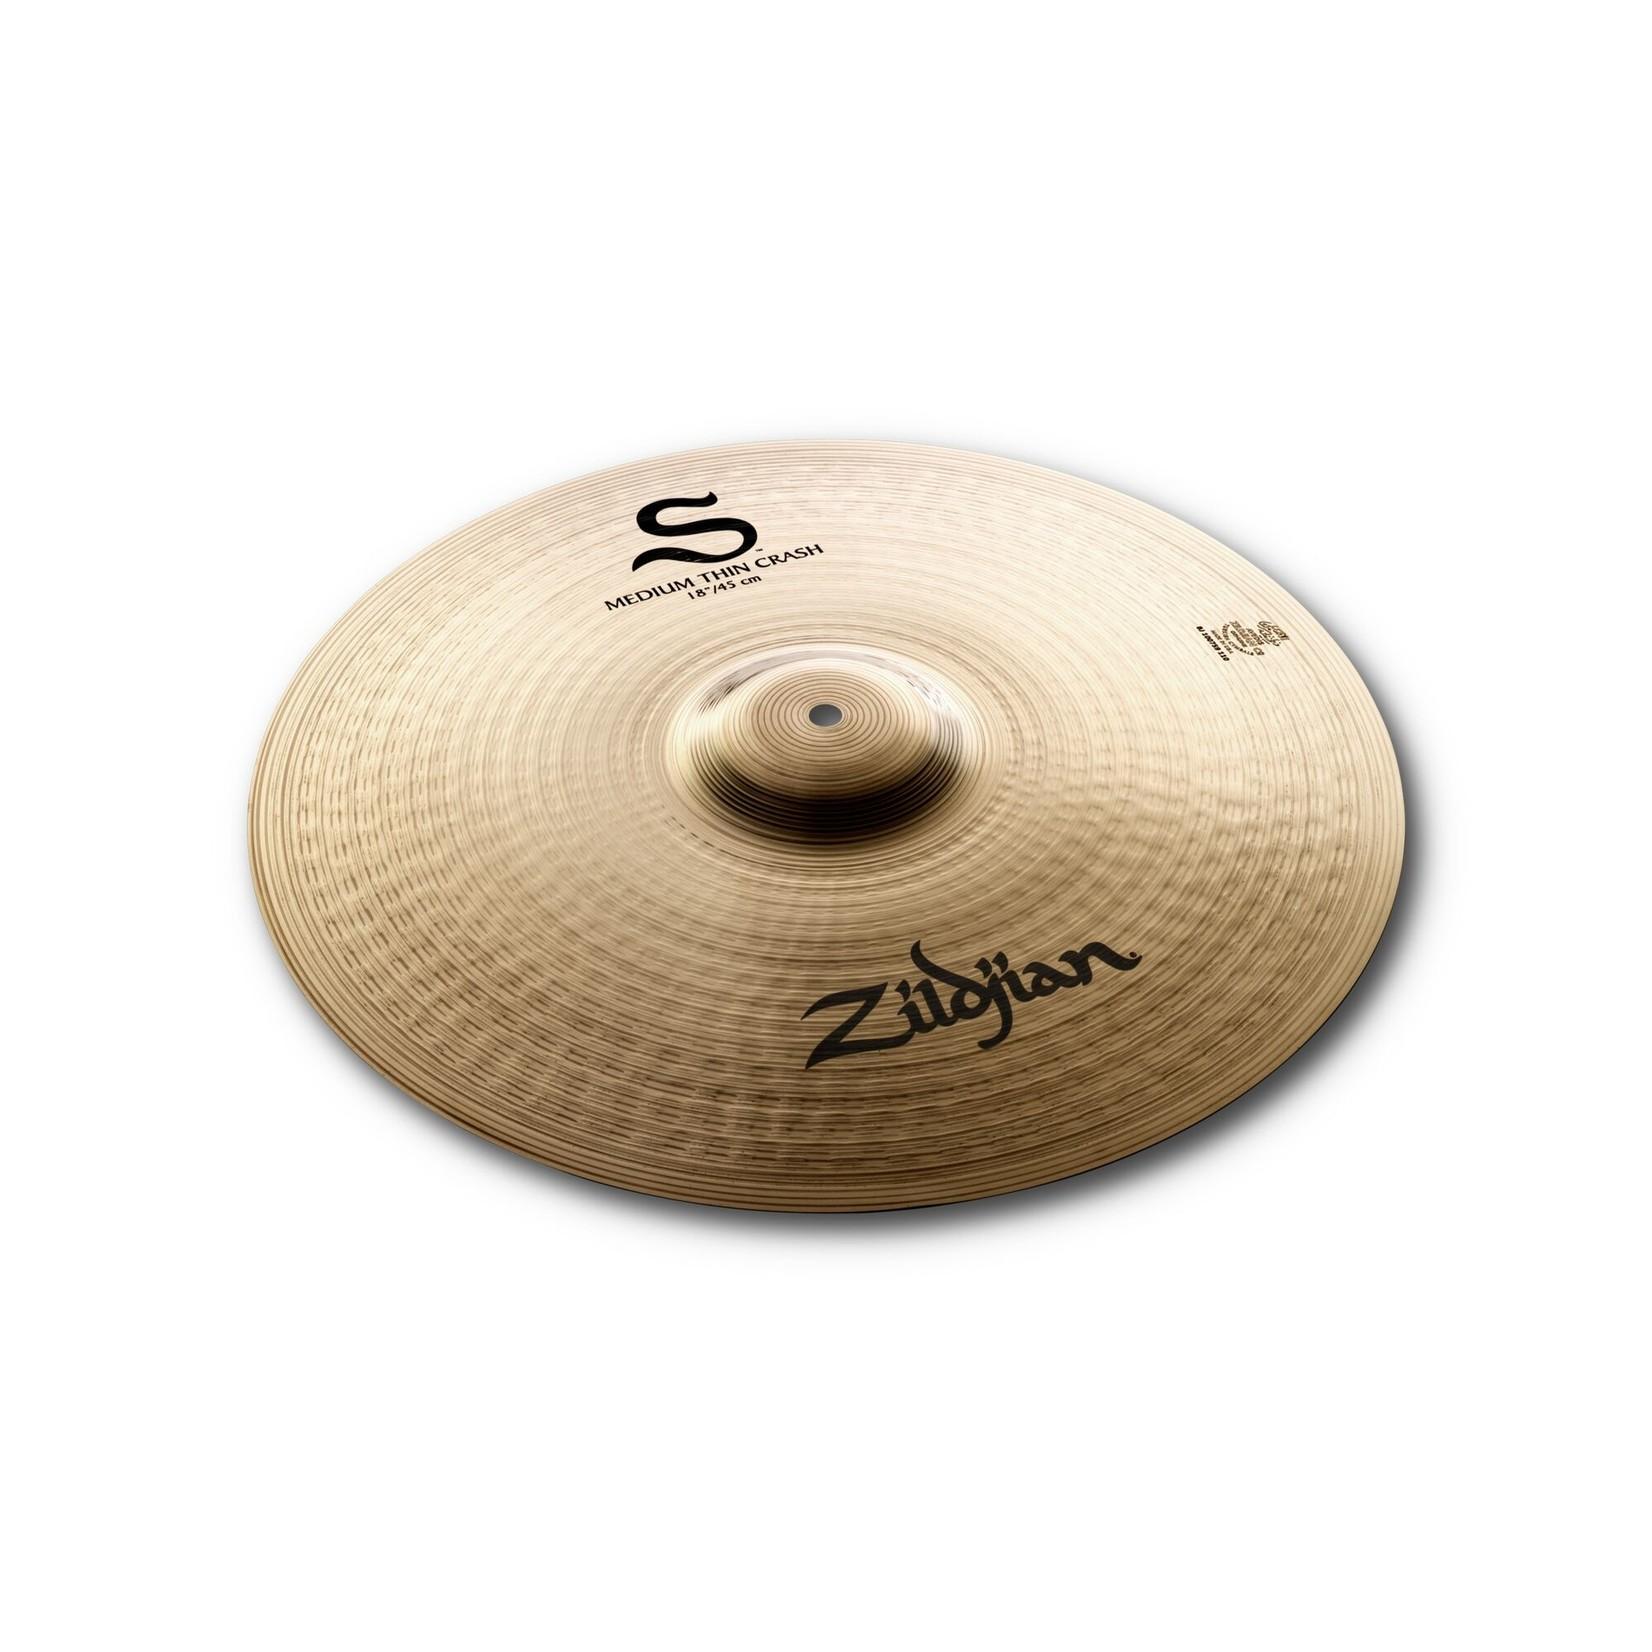 Zildjian Zildjian 18'' S Medium Thin Crash